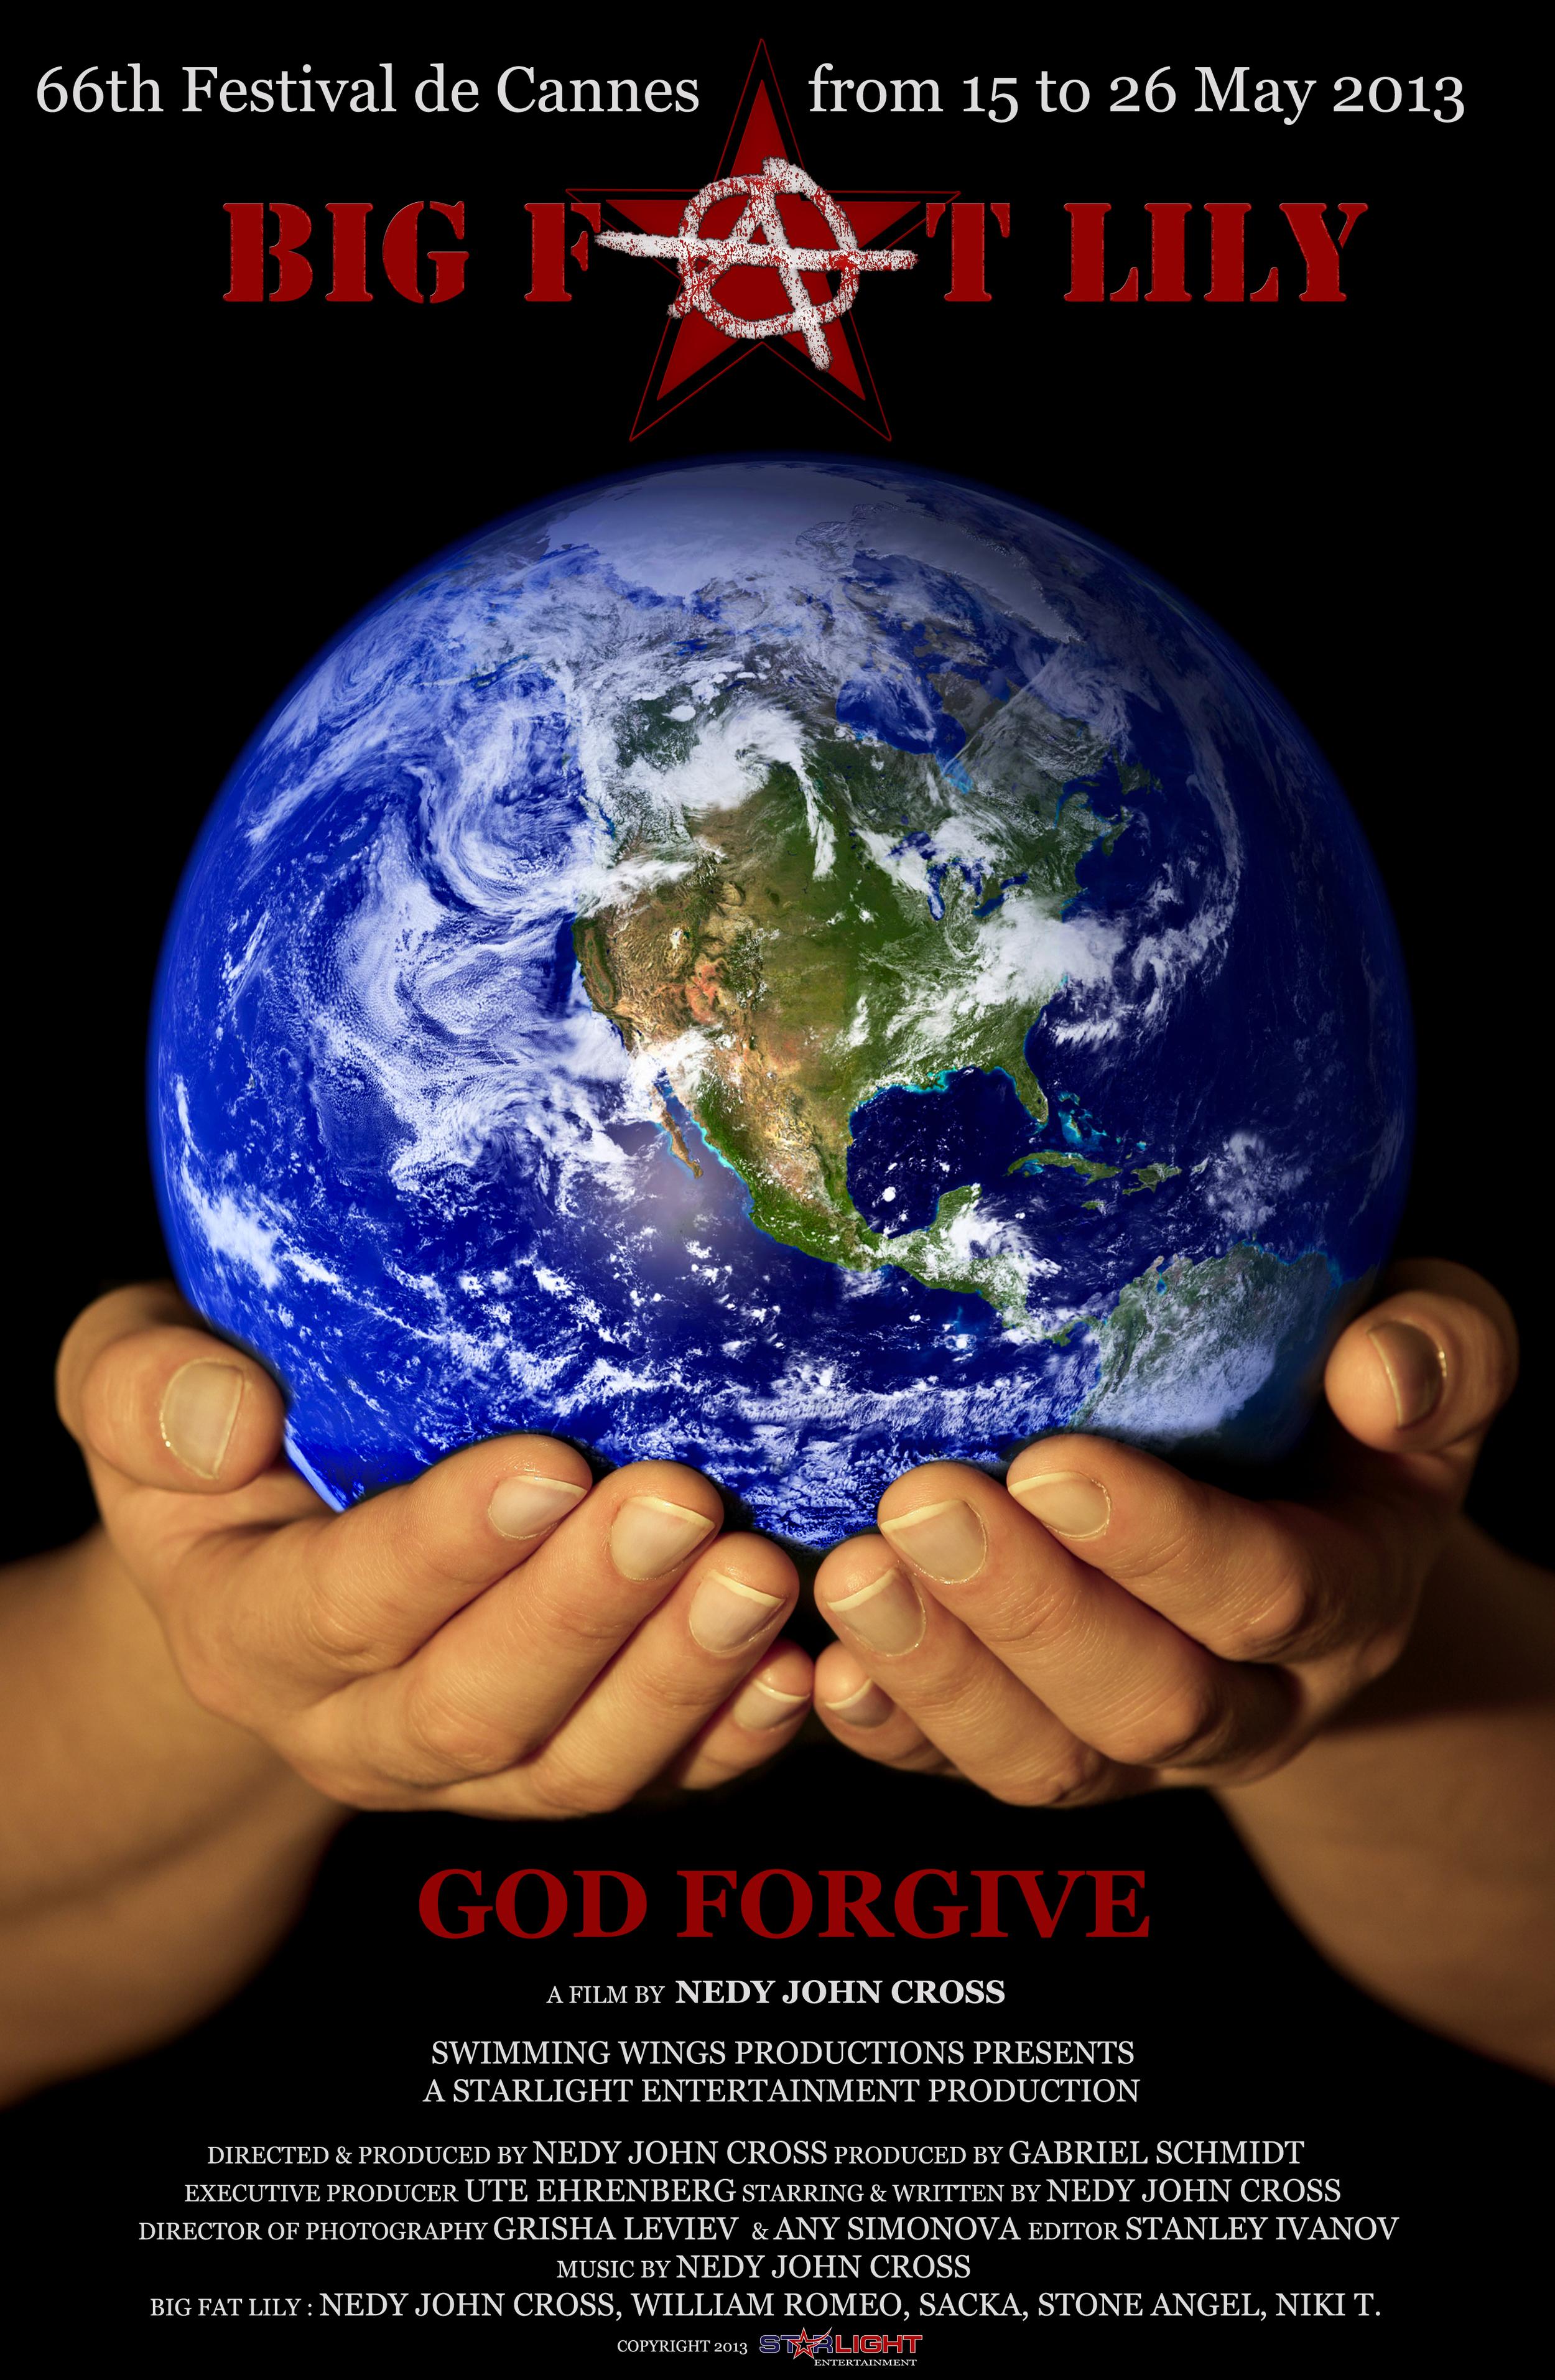 God forgive small.jpg